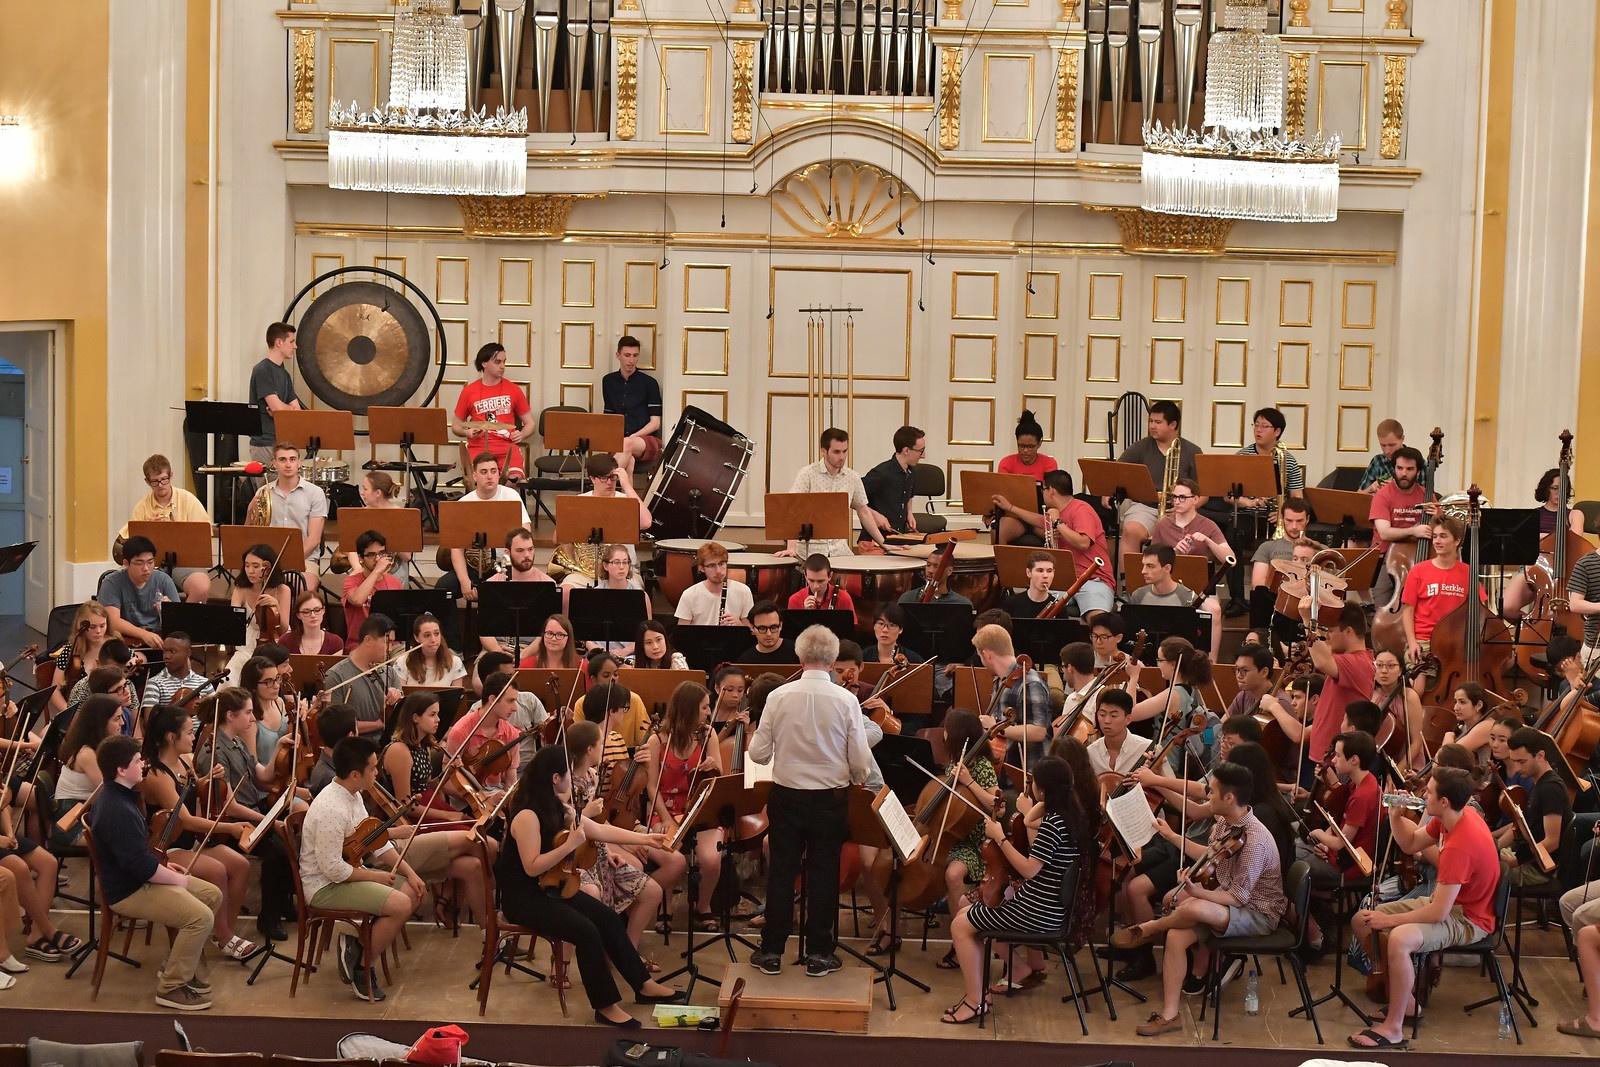 FY19 BPYO Tour - Salzburg Mozarteum Dress Rehearsal (credit - Paul Marotta)